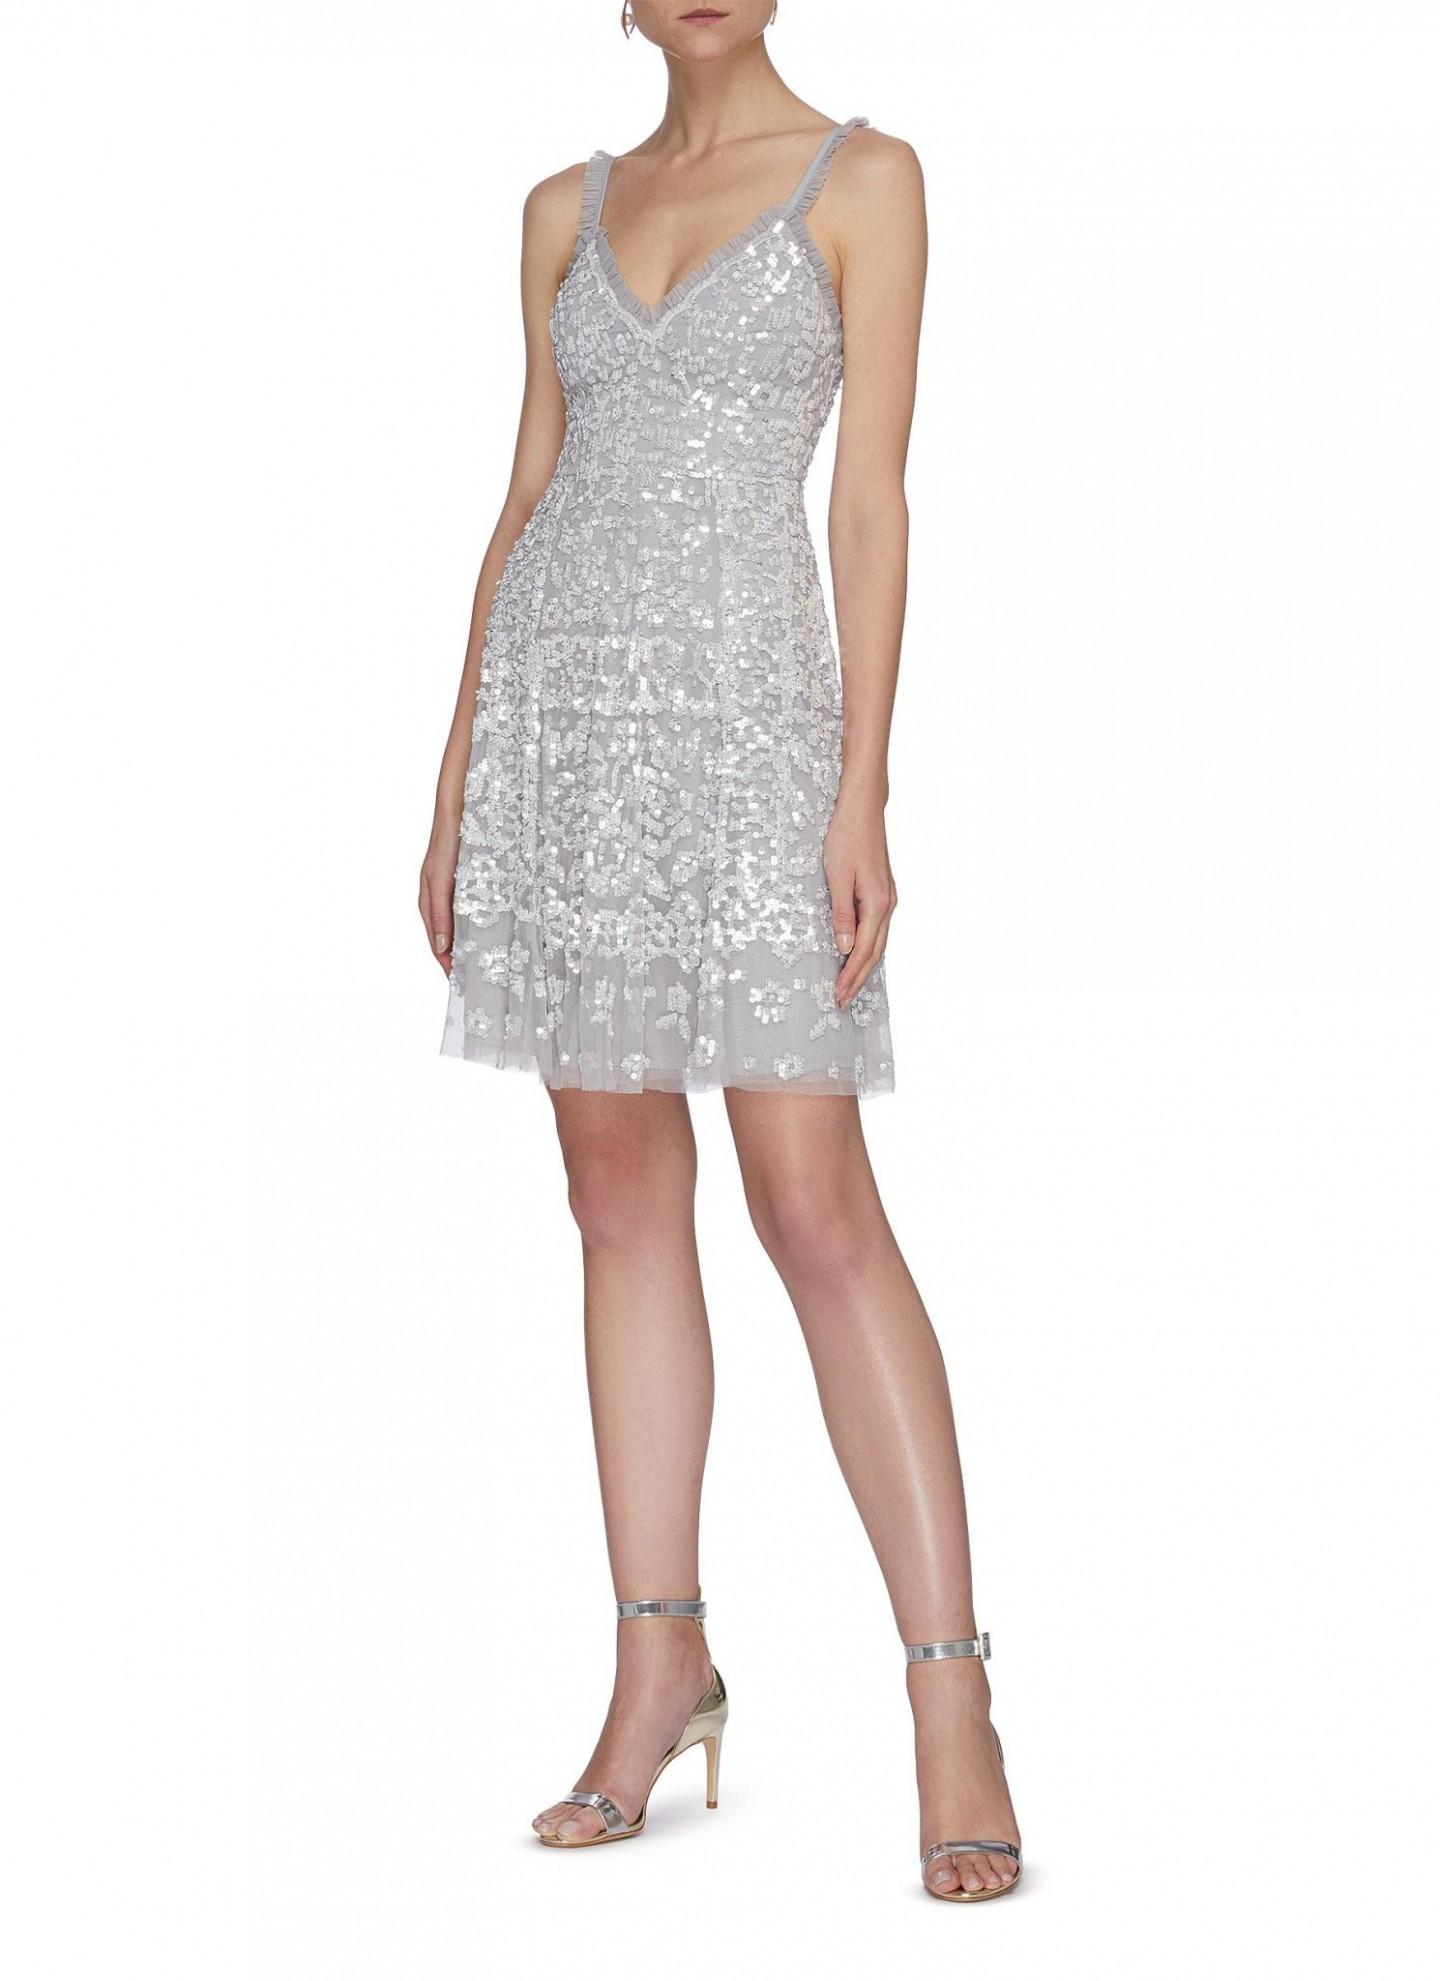 NEEDLE & THREAD Sequin Embellished Sleeveless Mini Dress